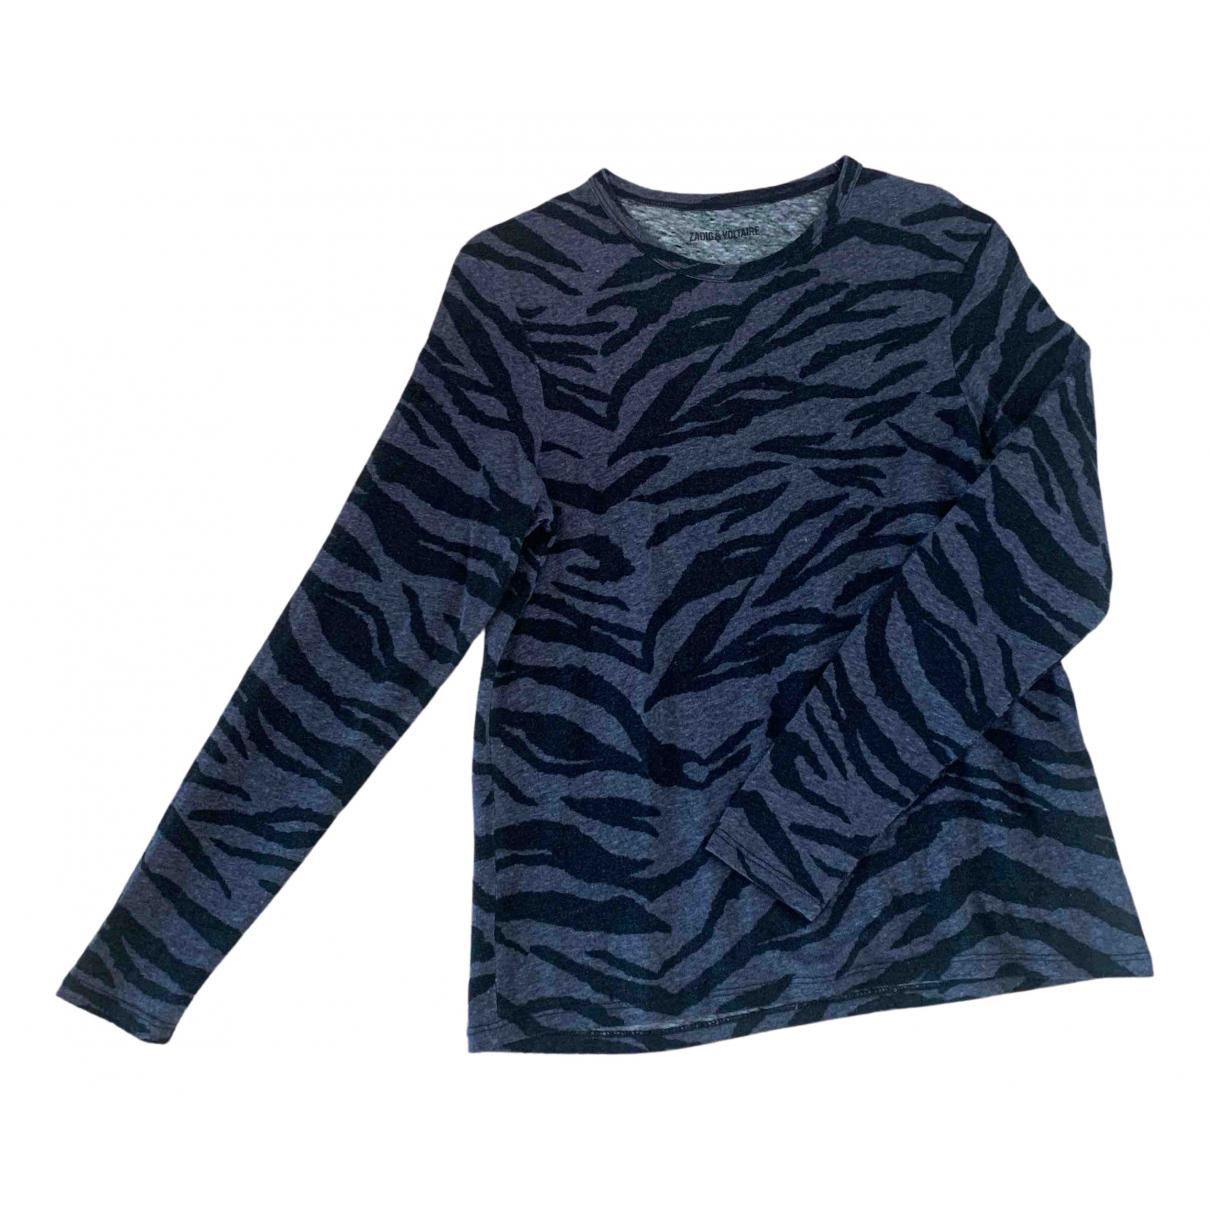 Zadig & Voltaire Fall Winter 2019 Grey Linen  top for Women S International